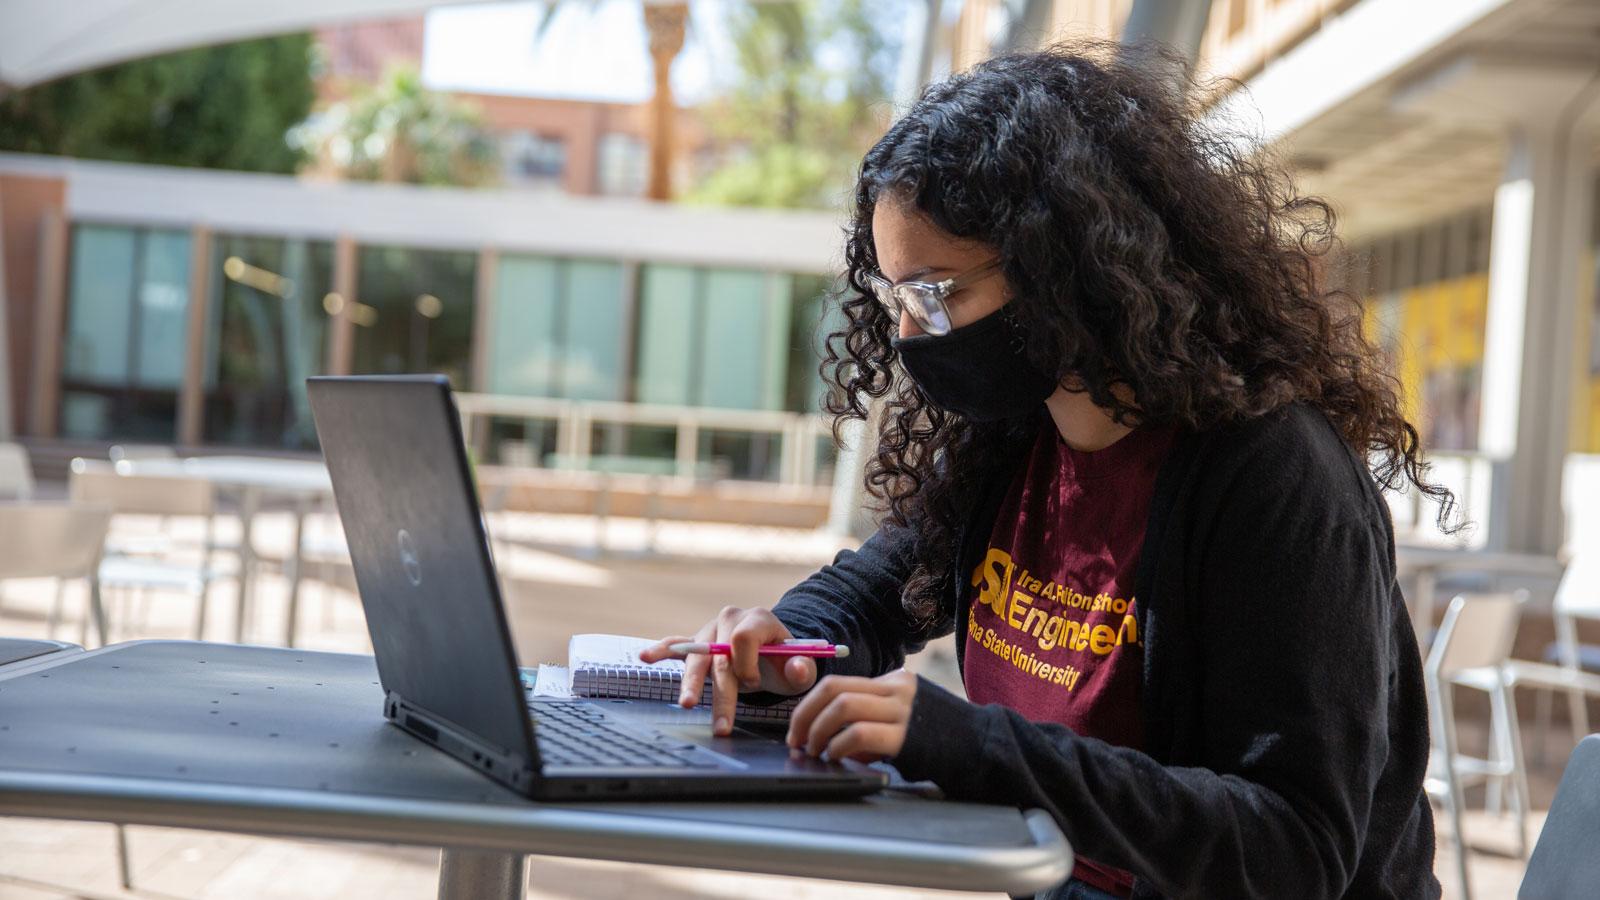 Sabrina Cervantes Villa works on a laptop outside.